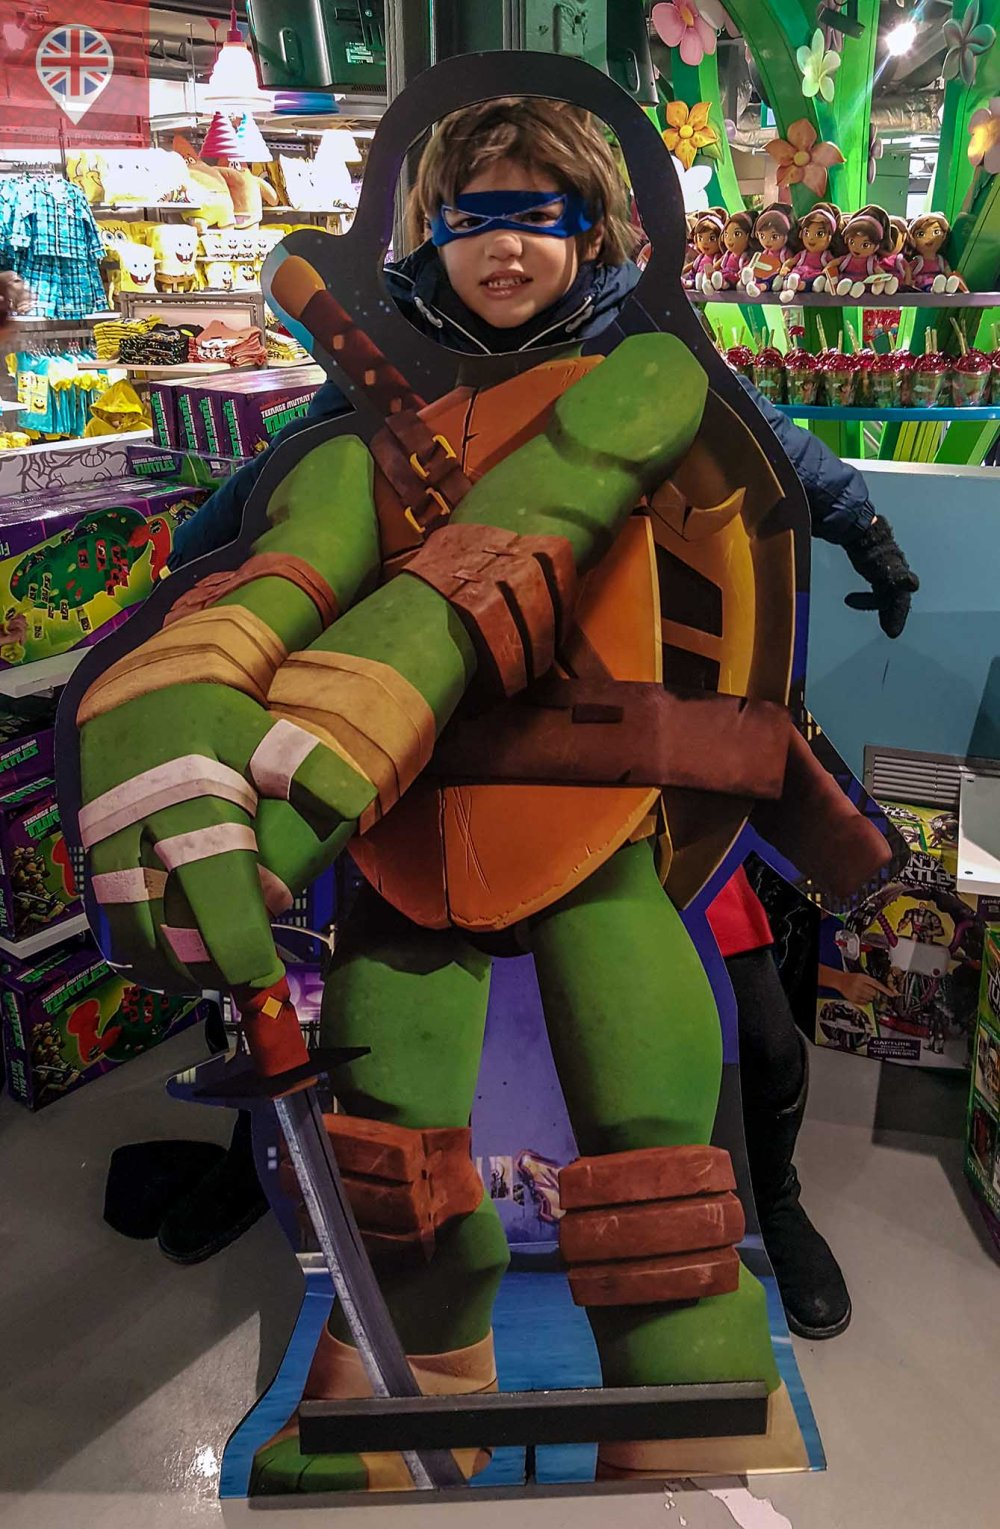 Nickelodeon store JG ninja turtle